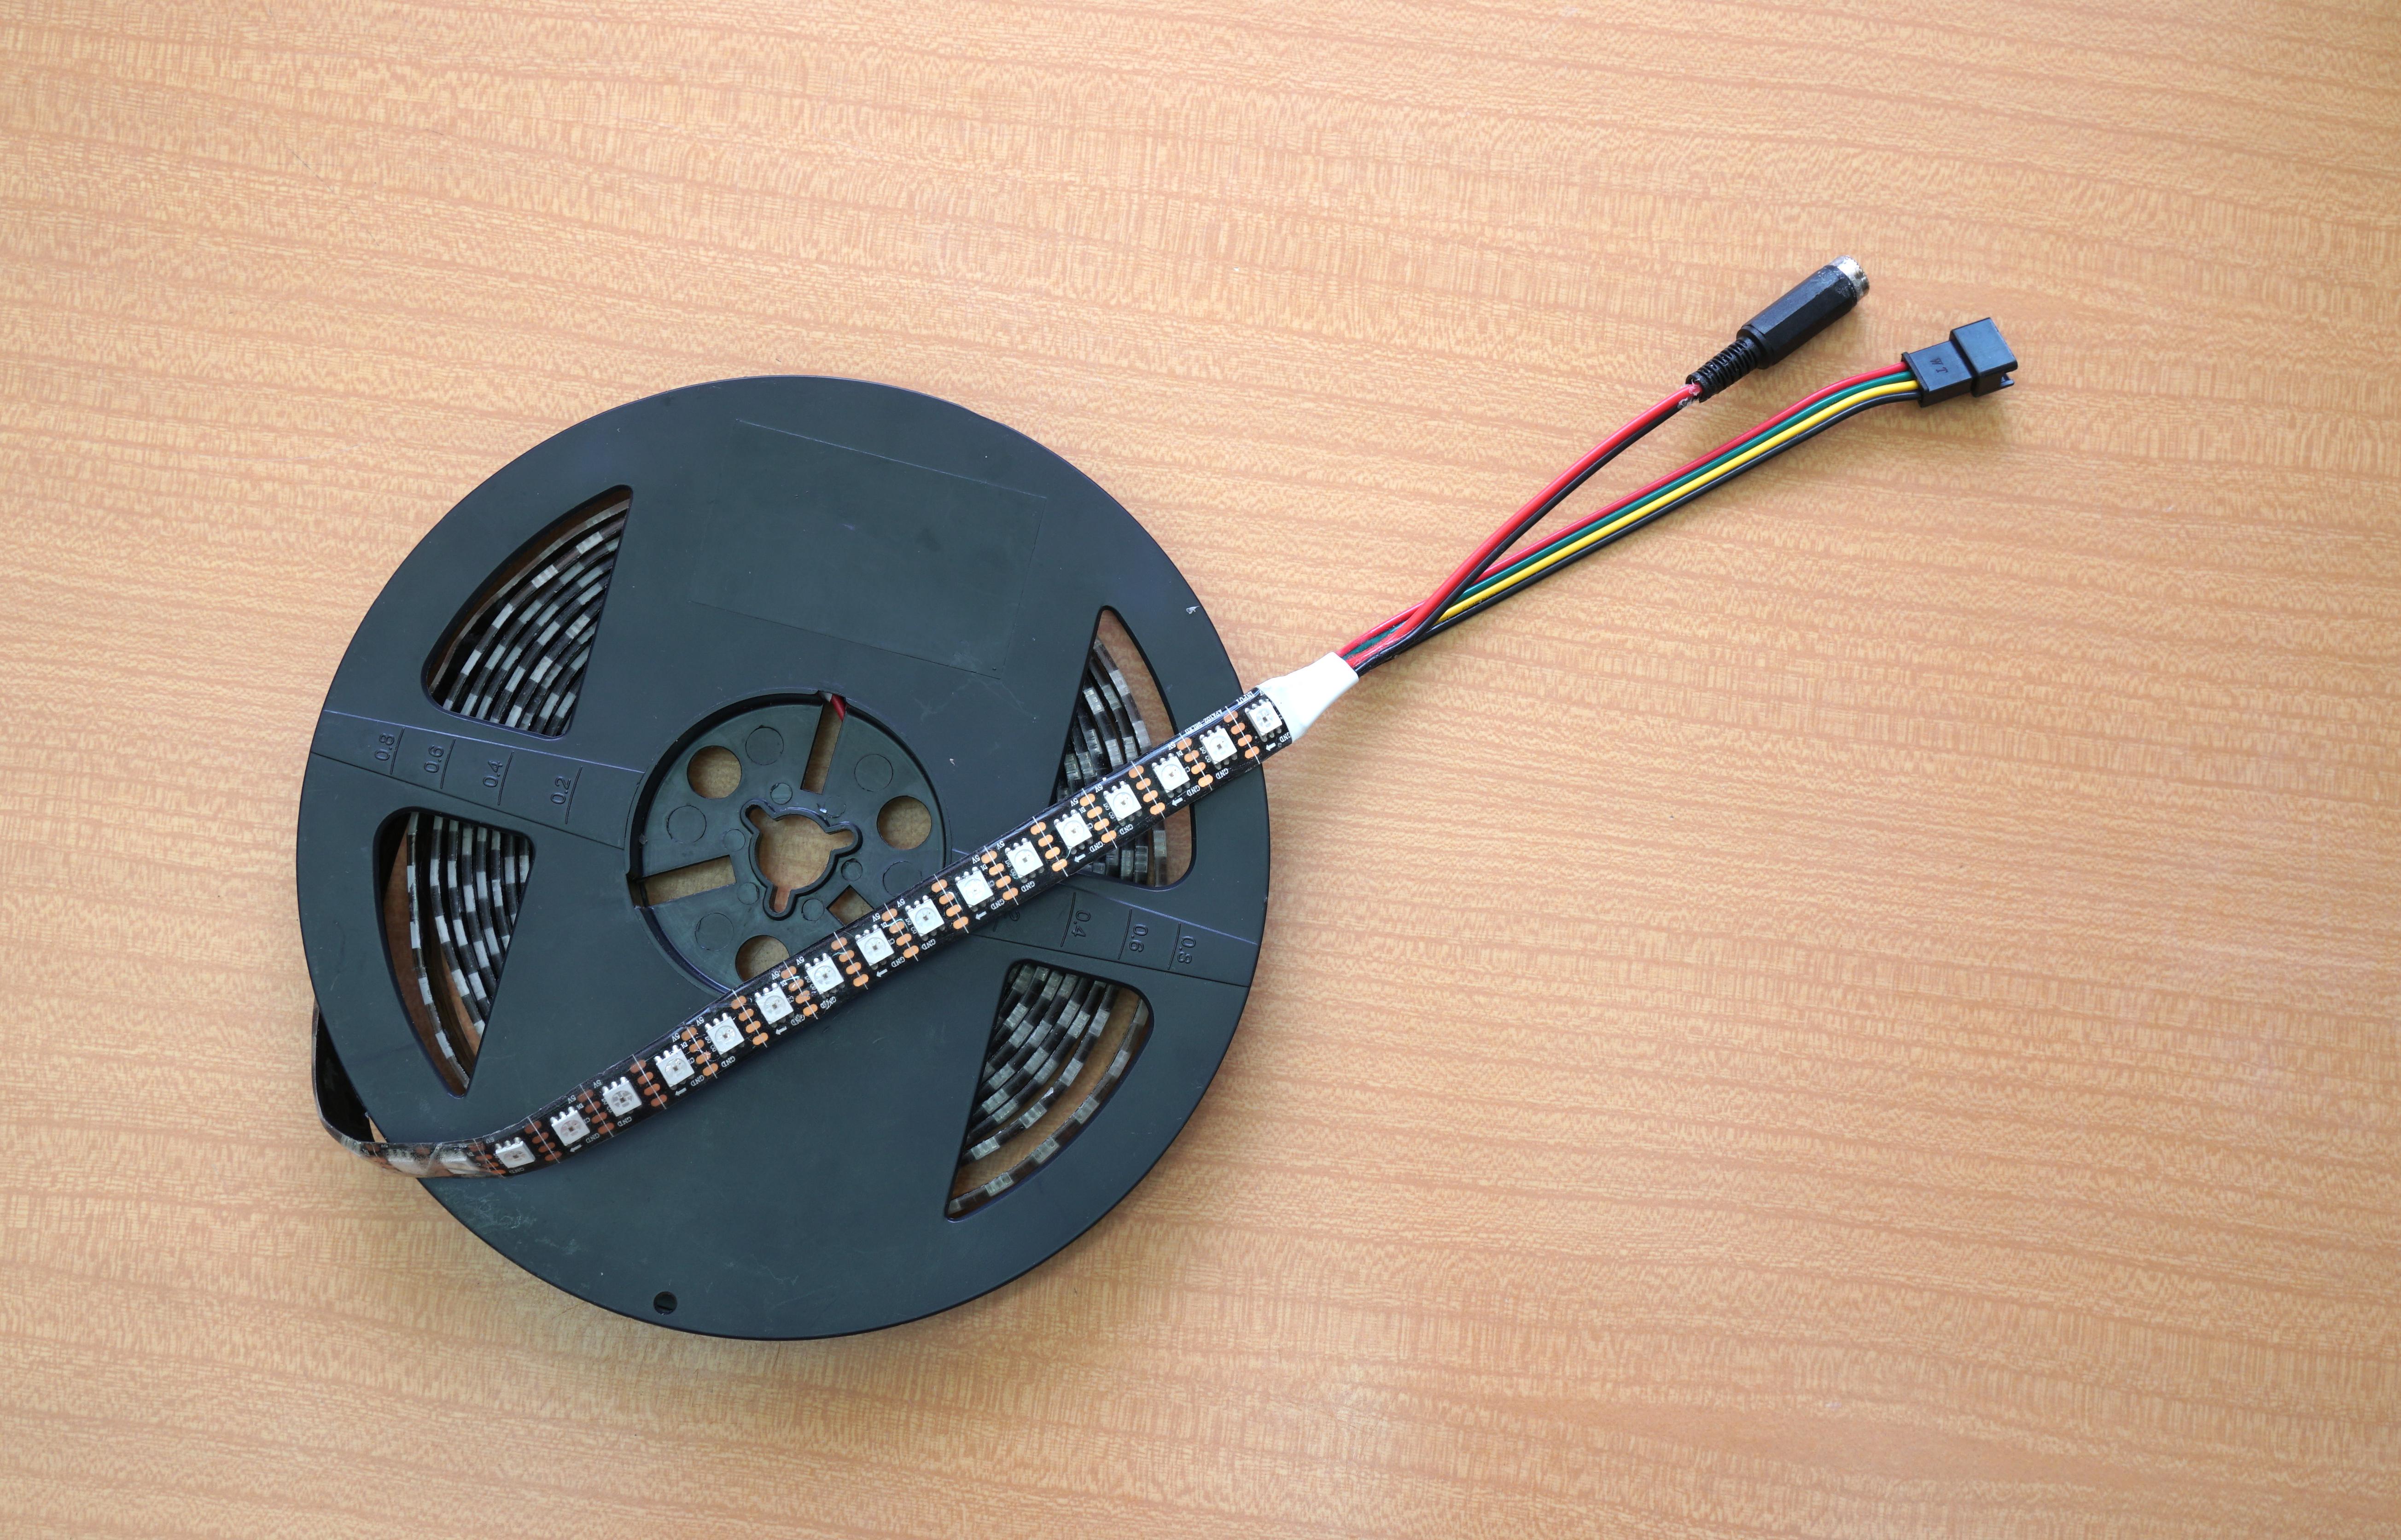 BlinkenSort with Sound - The Sound of LED Sorting Algorithms